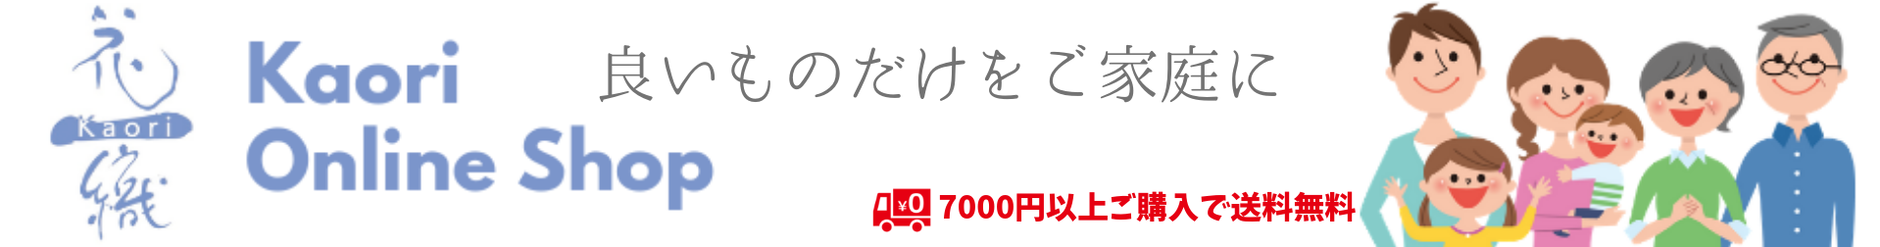 花織online shop